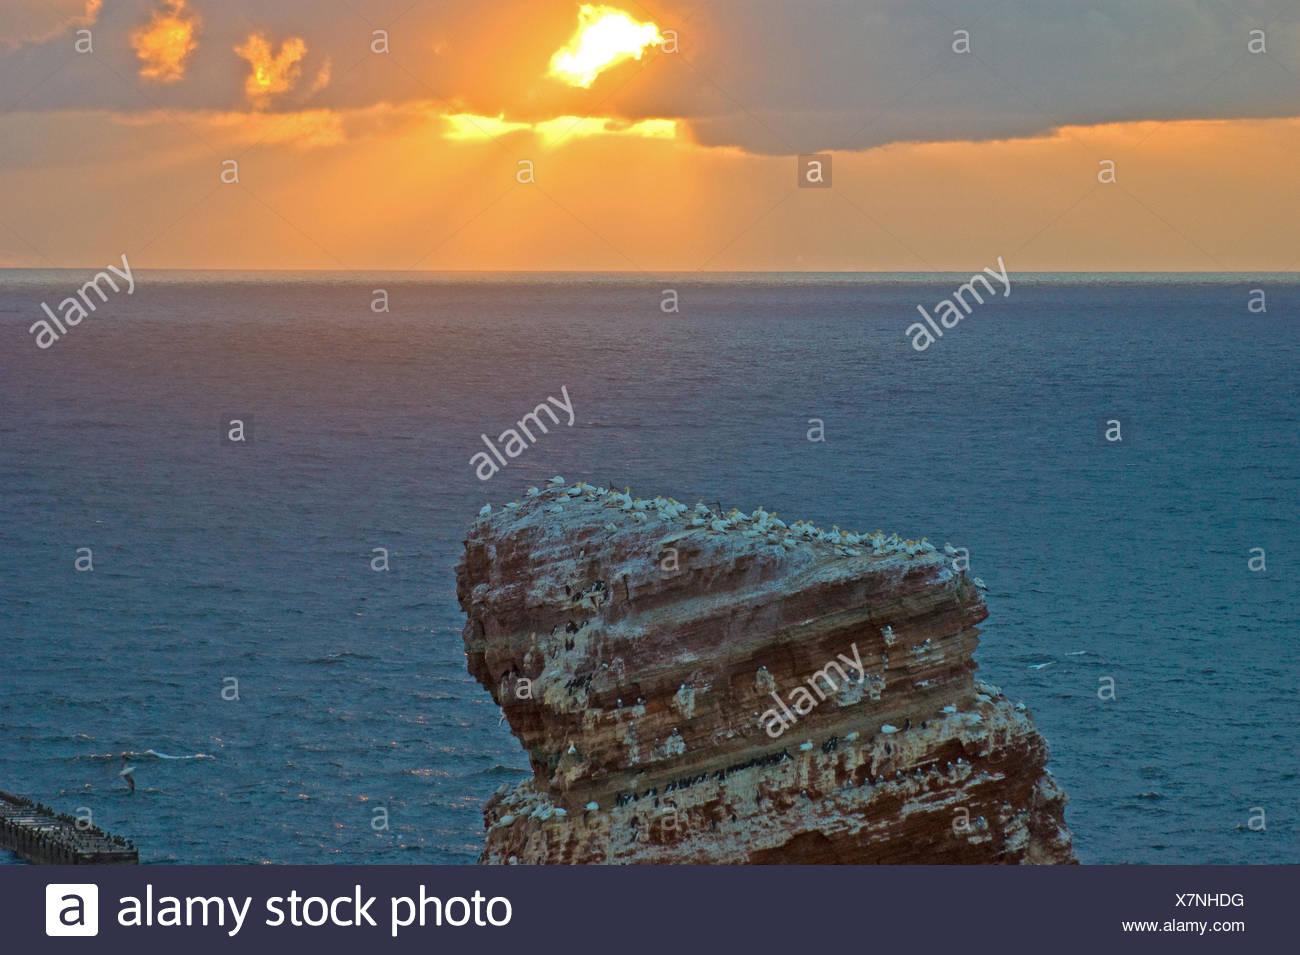 Germany, Schleswig-Holstein, Helgoland, rock spire Lange Anna, bird colony, sunset, - Stock Image